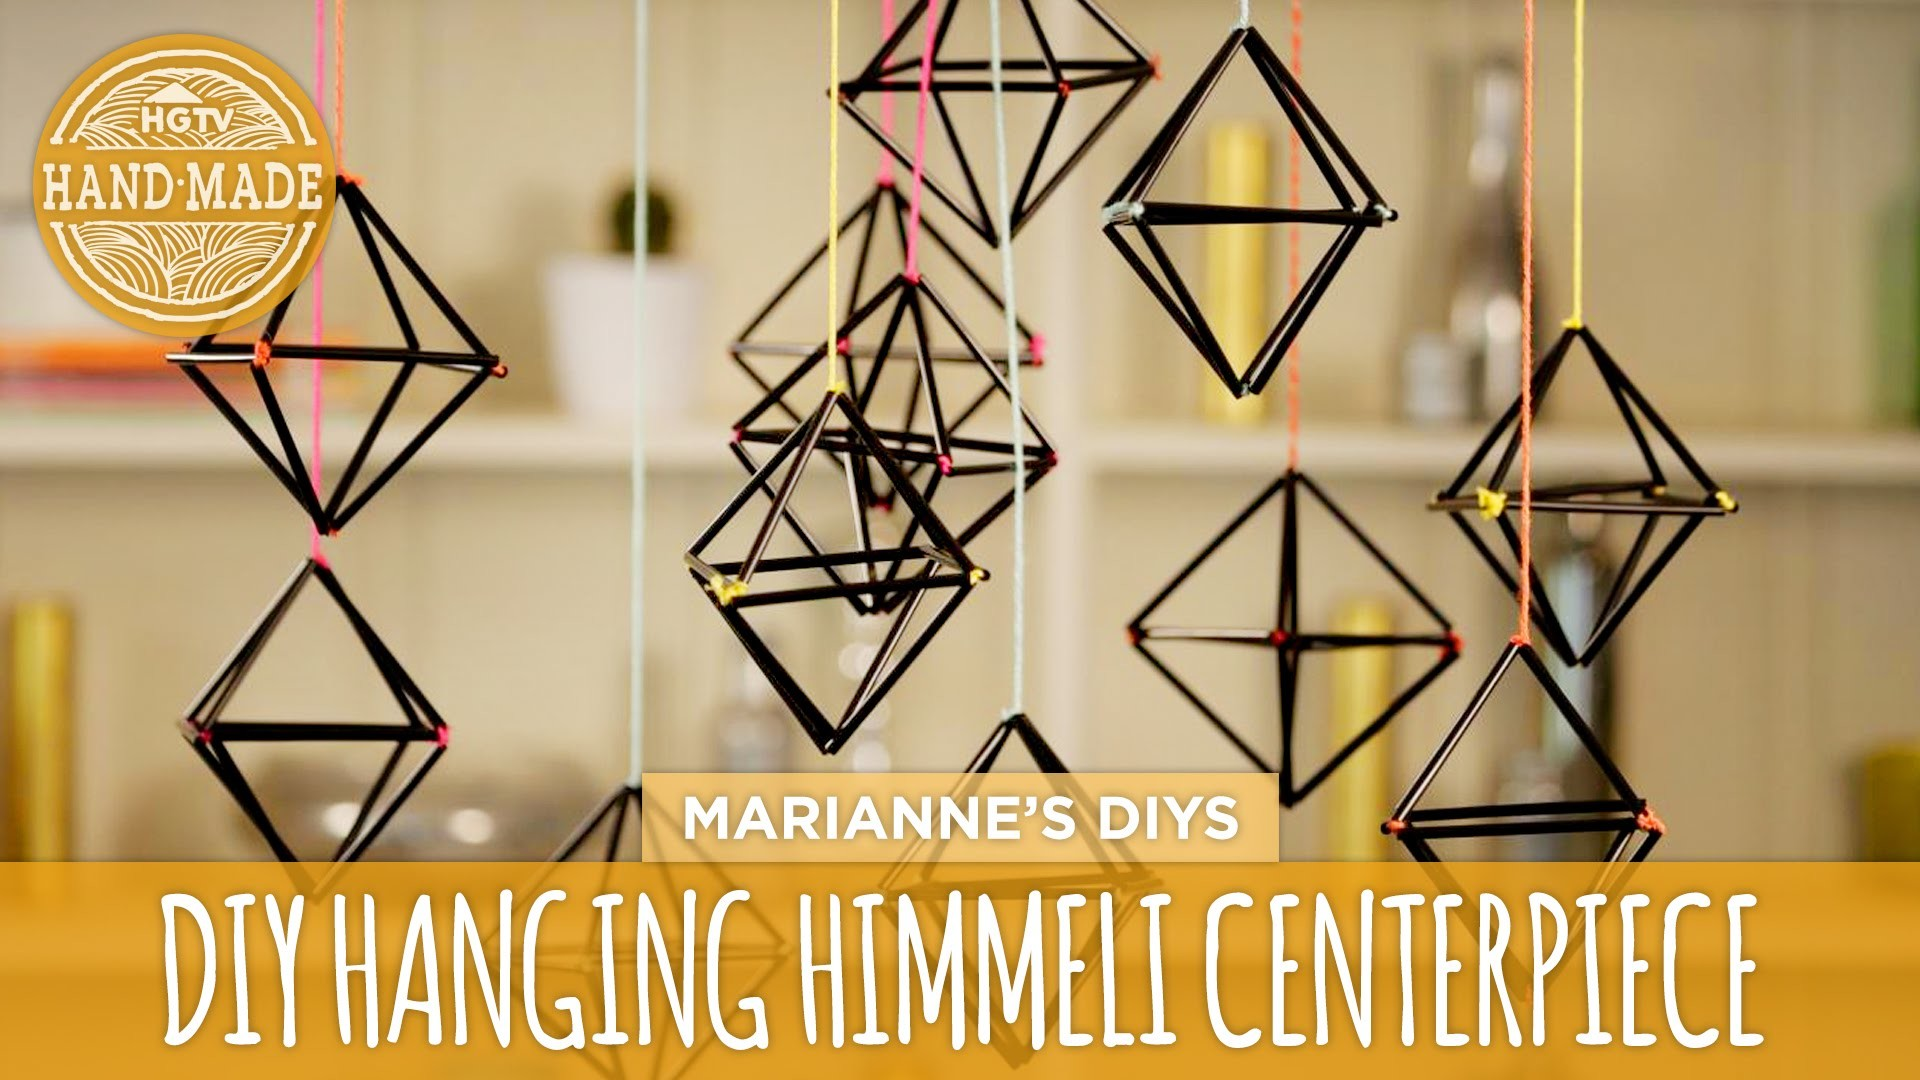 DIY Himmeli Centerpiece - HGTV Handmade